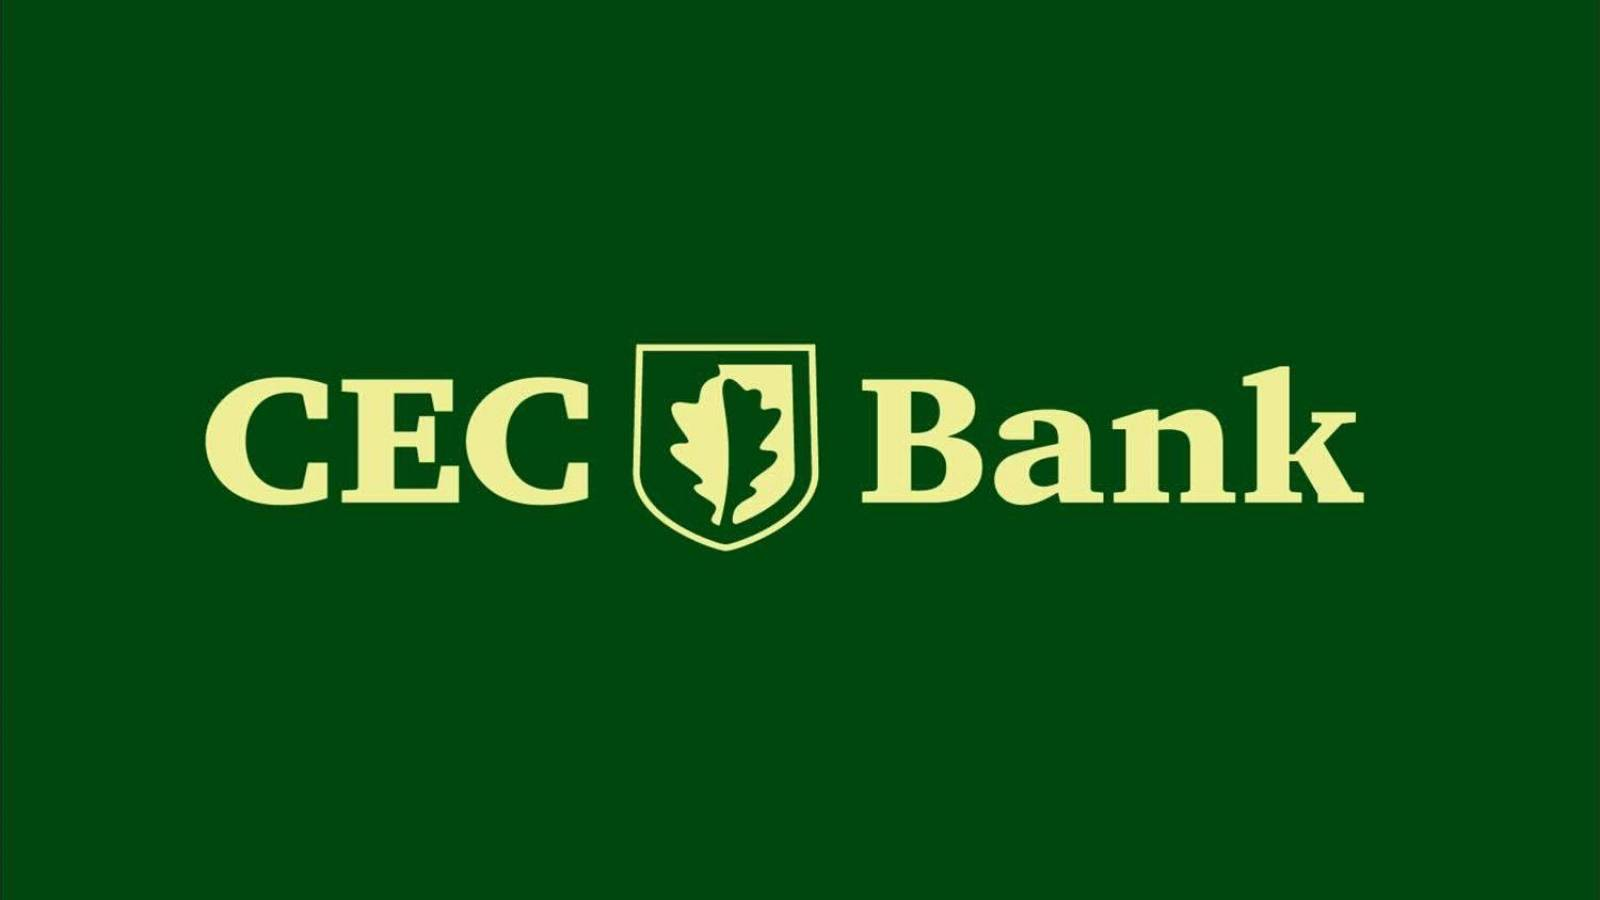 CEC Bank ultimatum